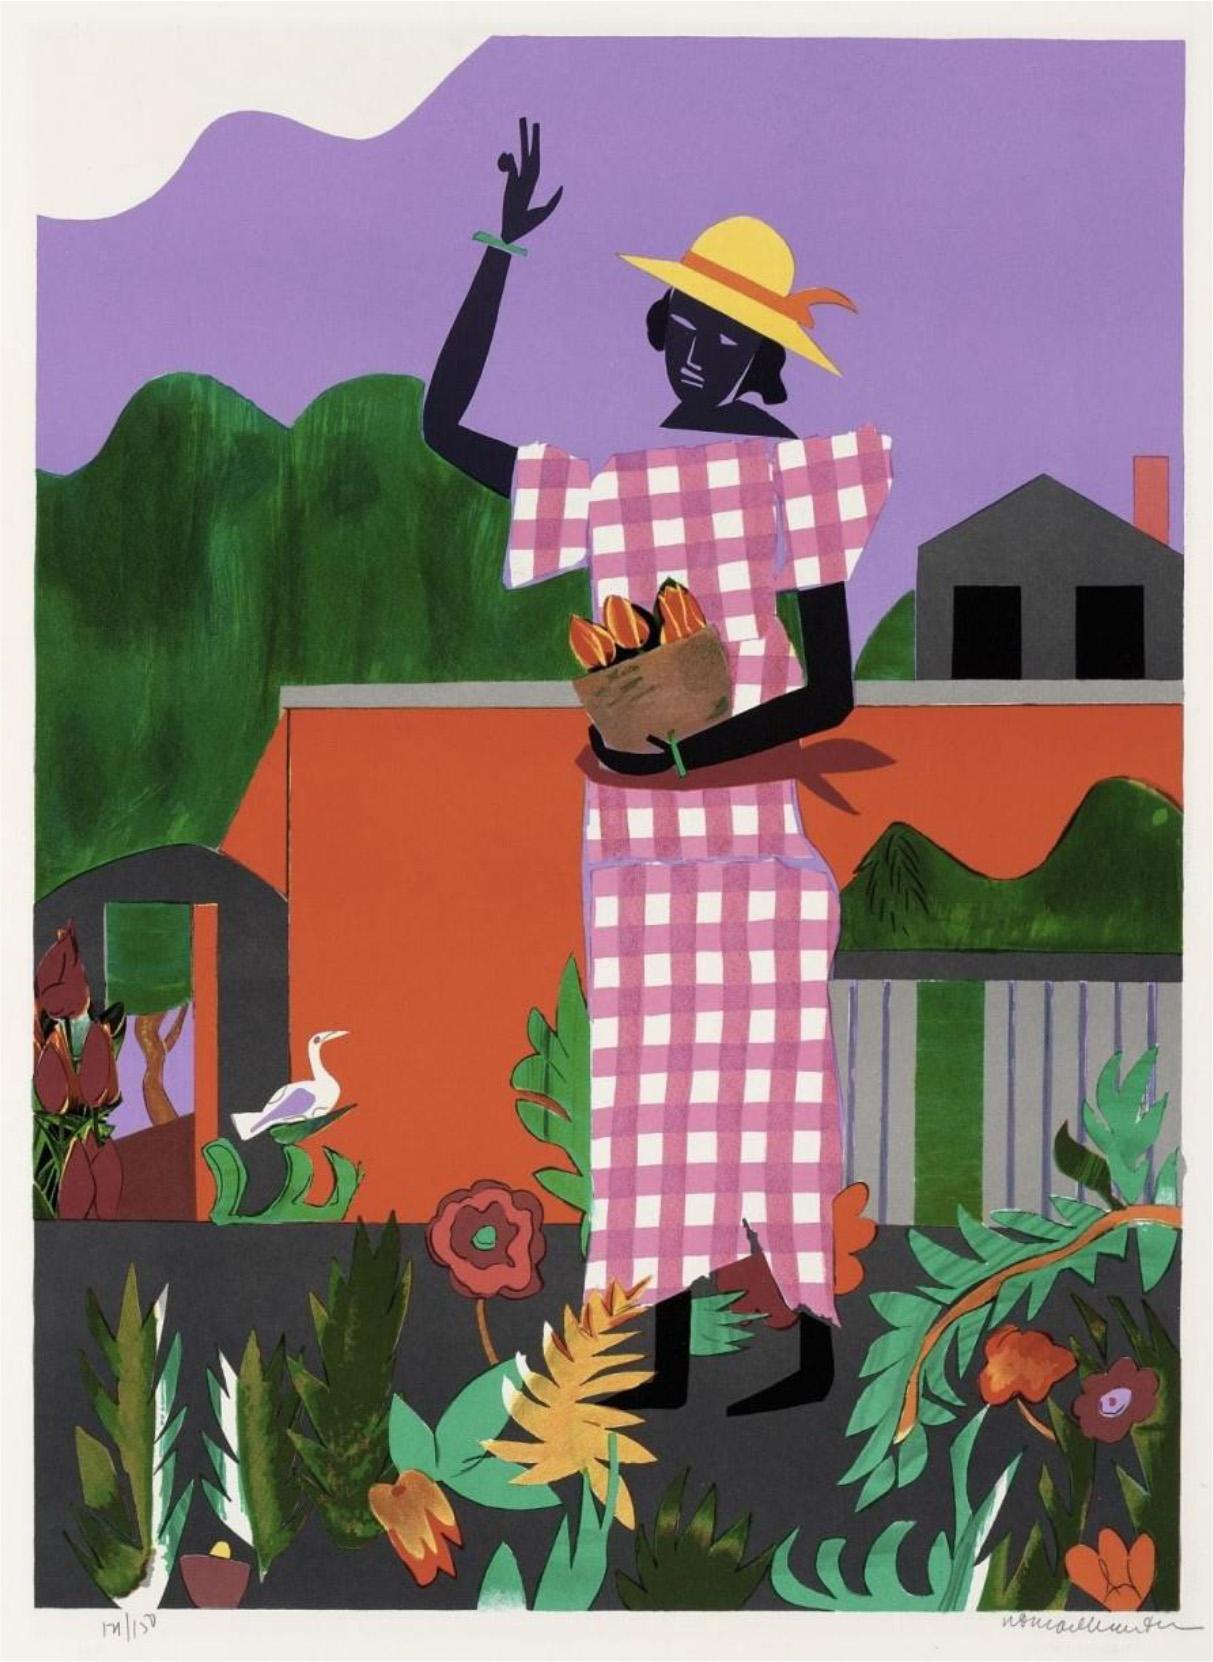 Romare Bearden, In the Garden (1979)